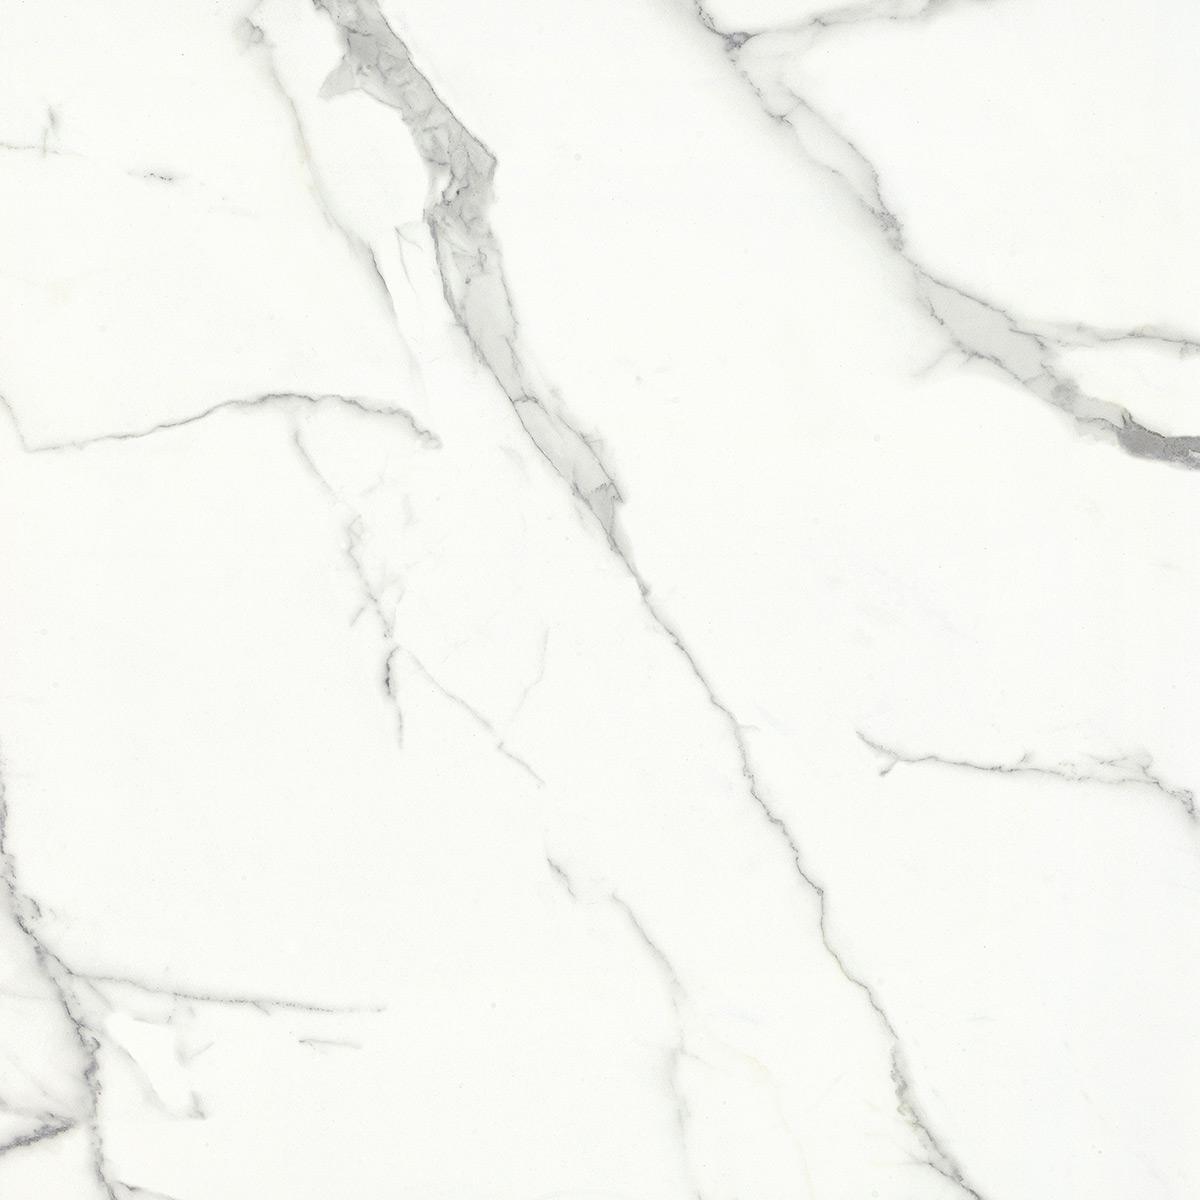 鱼肚白  HPEG80012、HPEG96012(800x800mm、600x900mm)